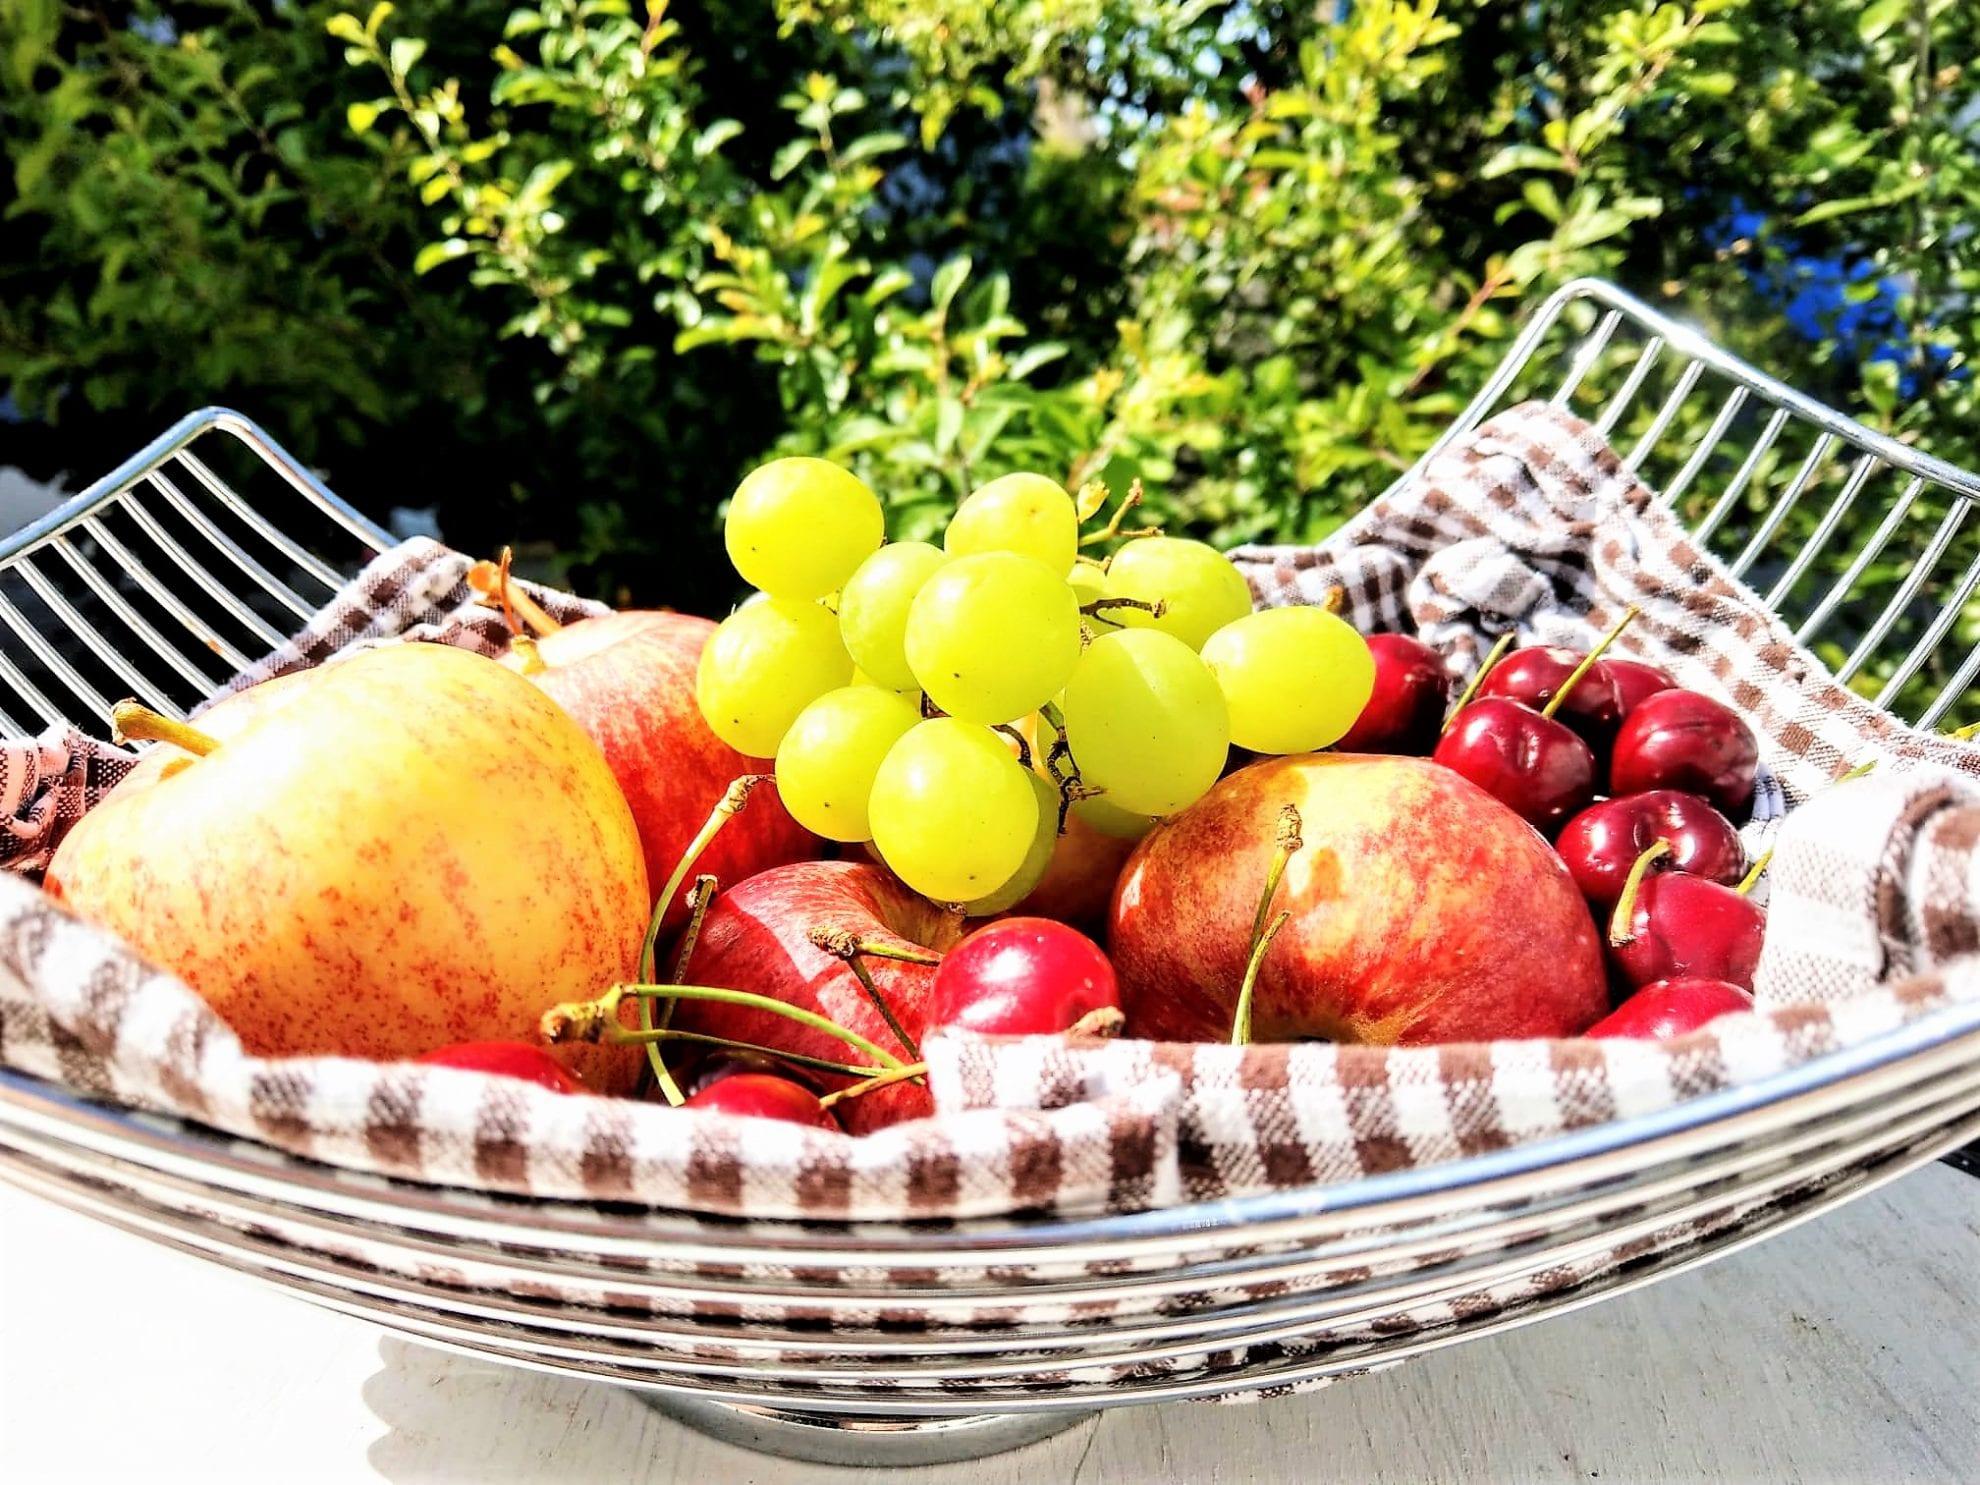 Snackideen, Obstkorb, Obst, Sommer, kinderleicht, Kindgerecht, Titelbild